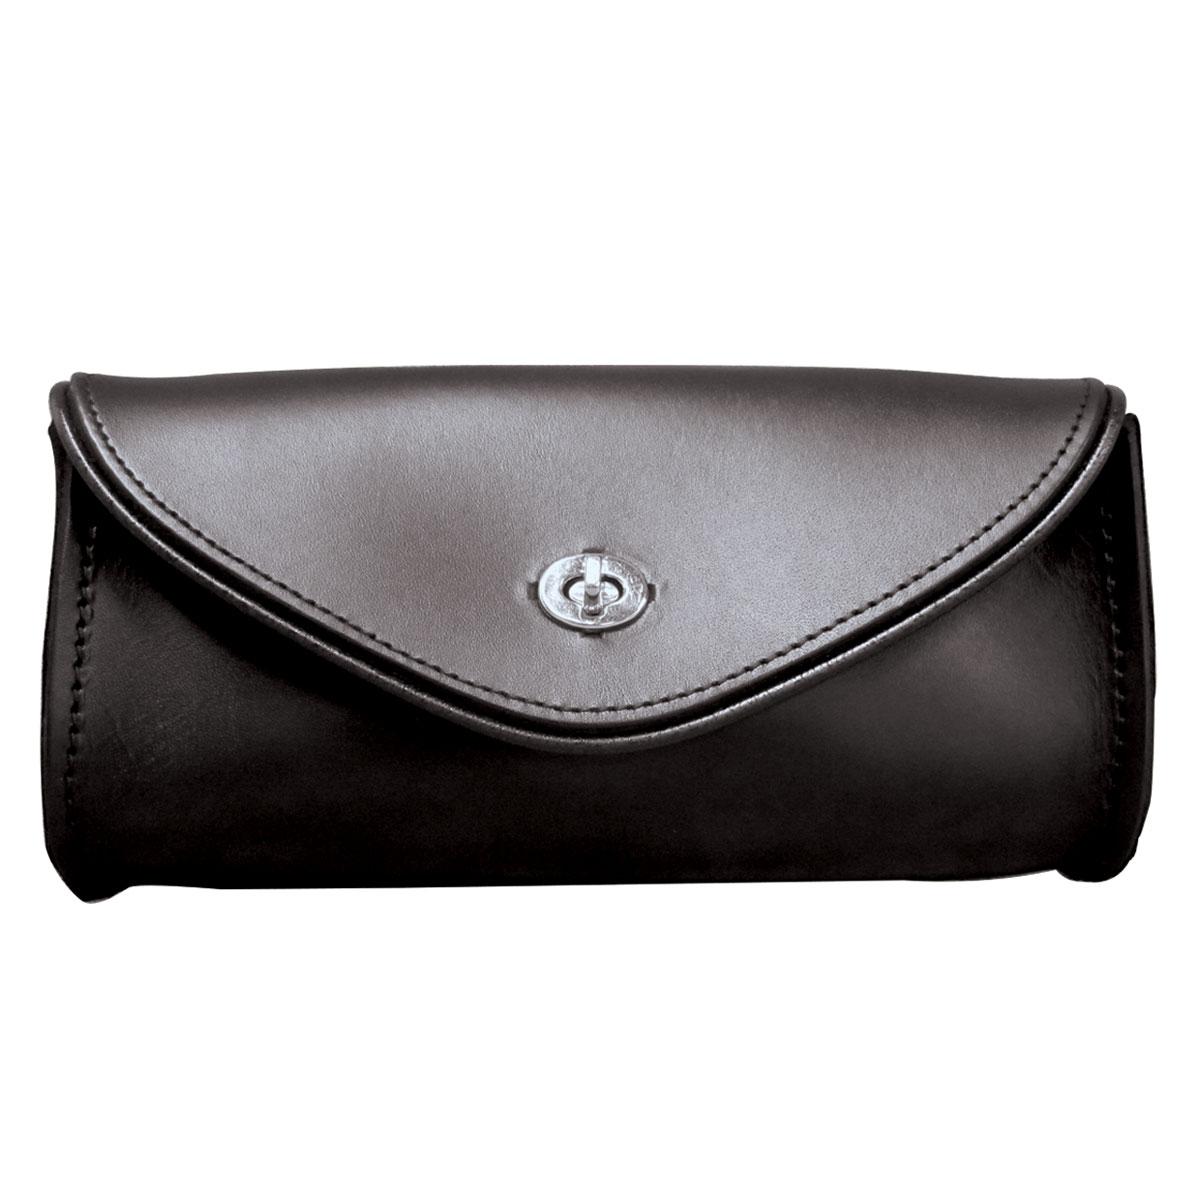 Leatherworks, Inc. Windshield Bag